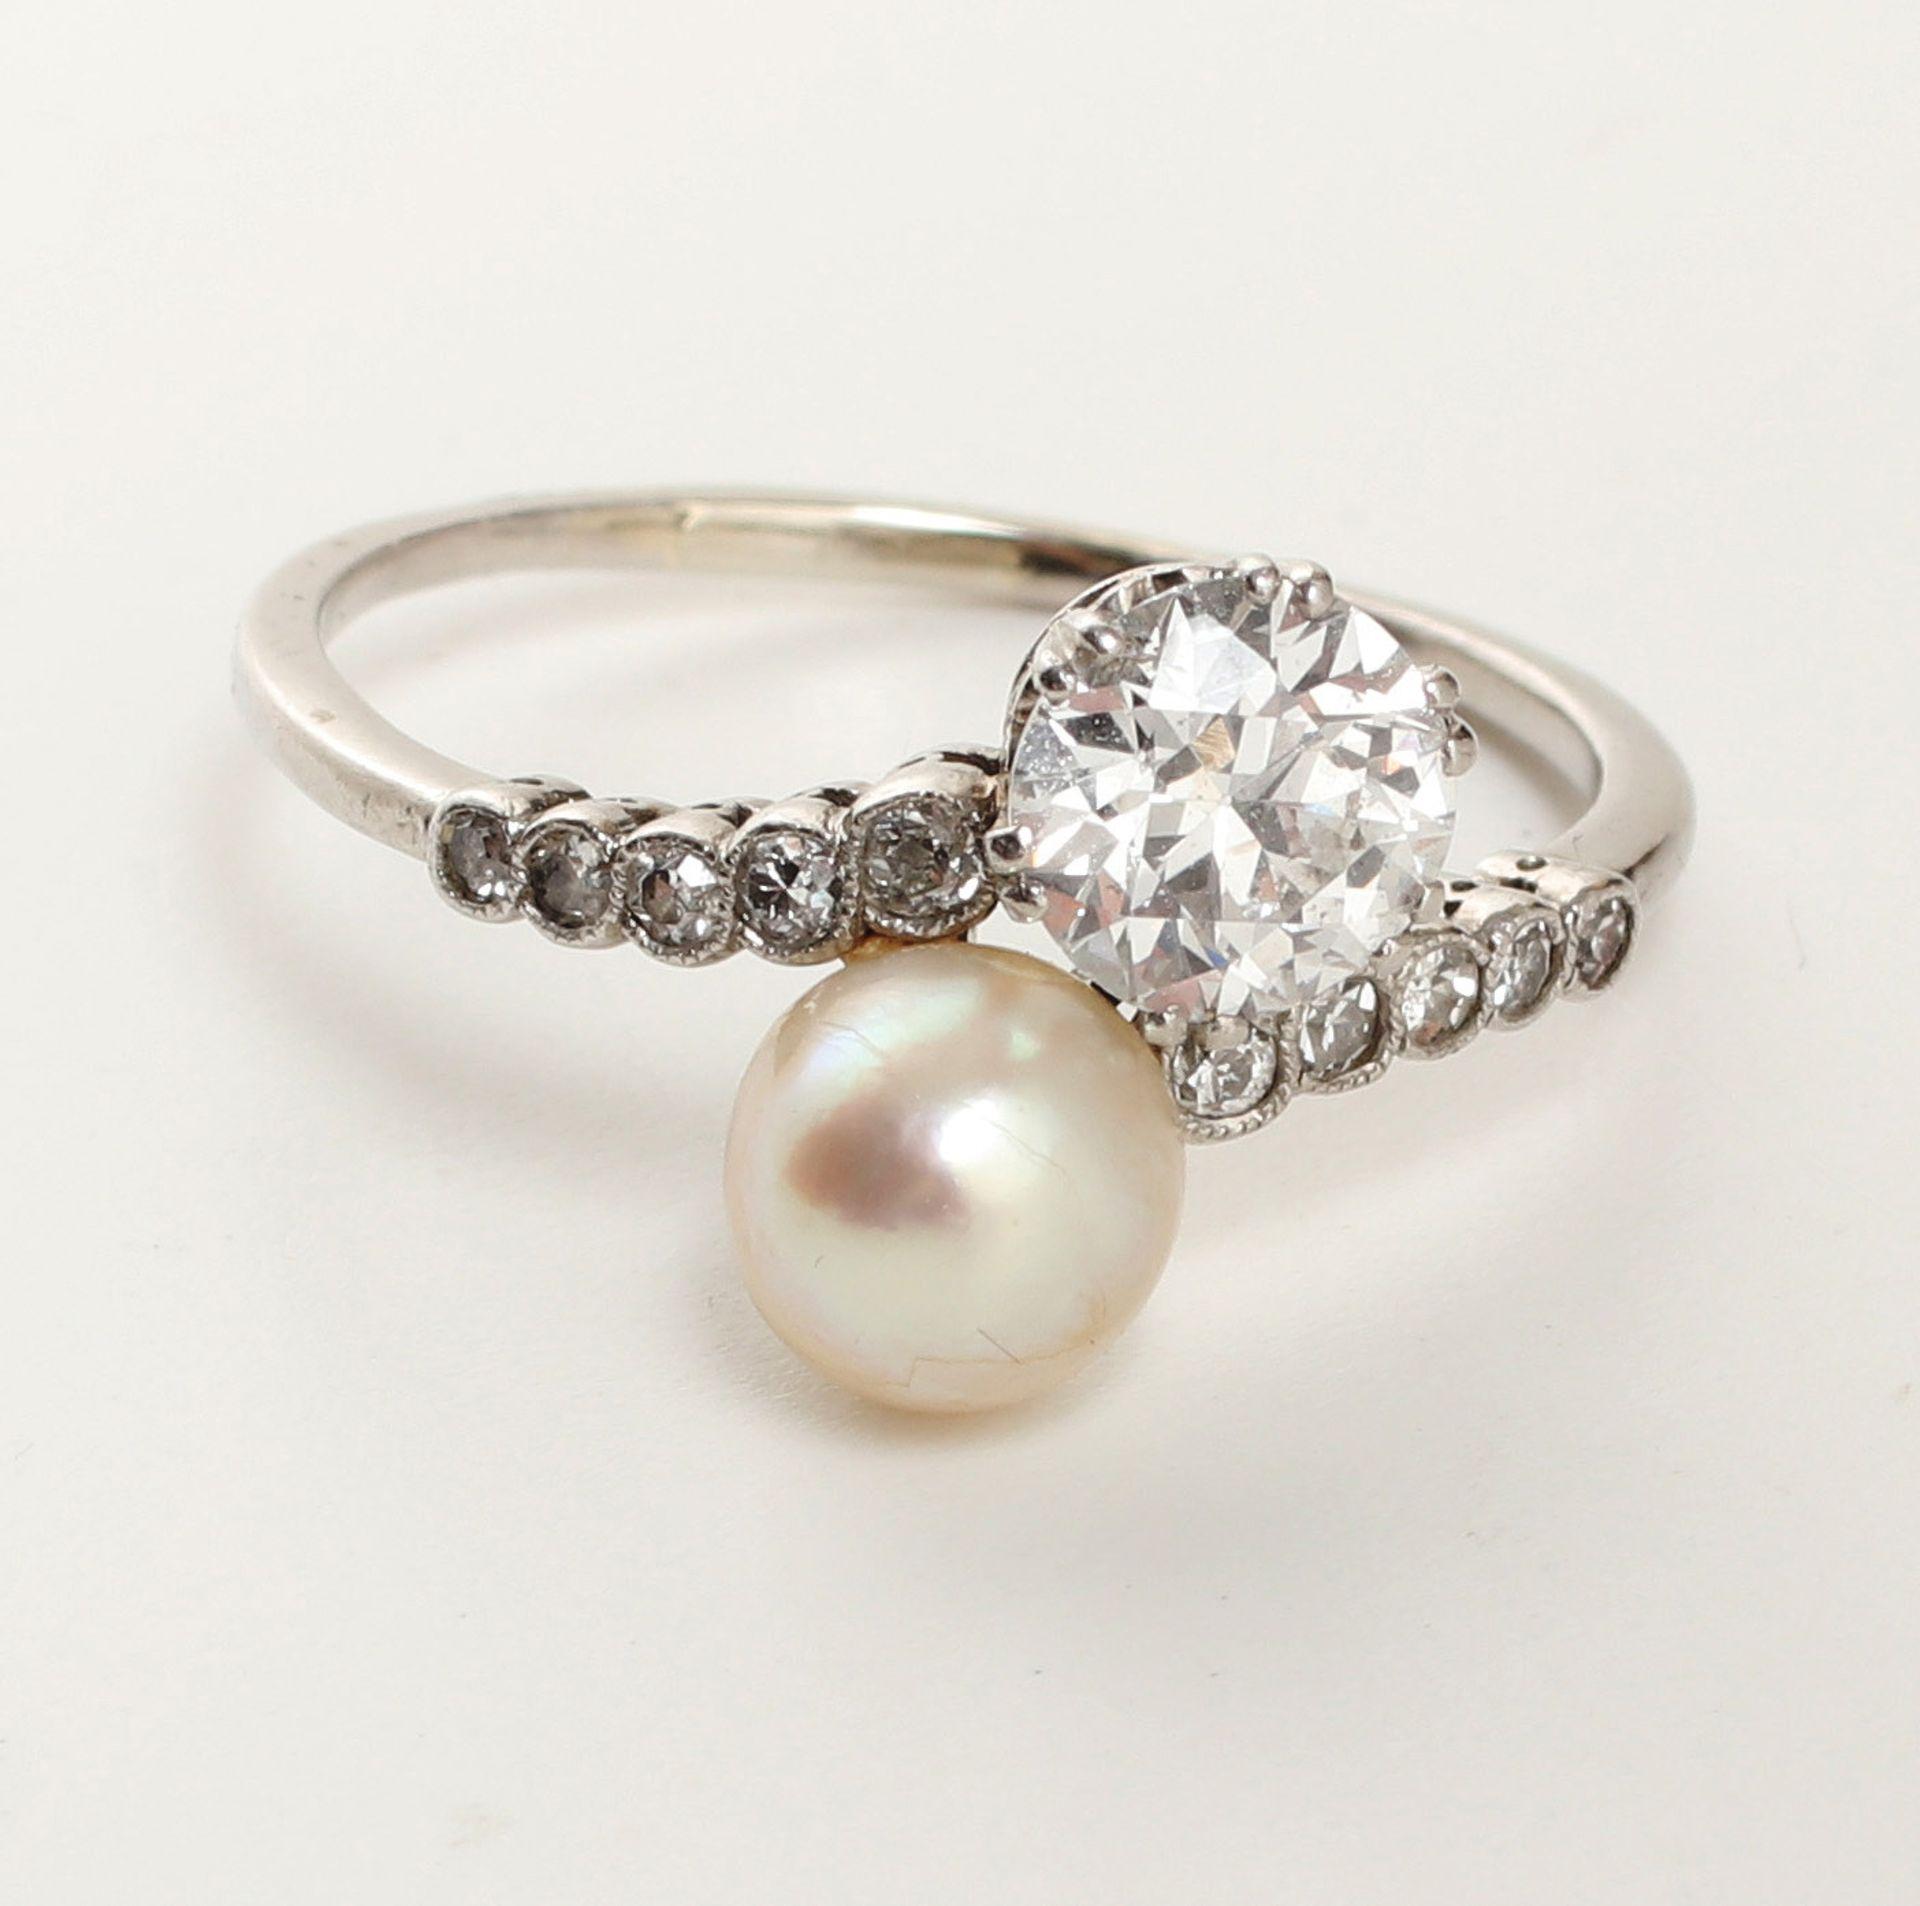 Ring, um 1910-20, 21,6 K WG oder Platin